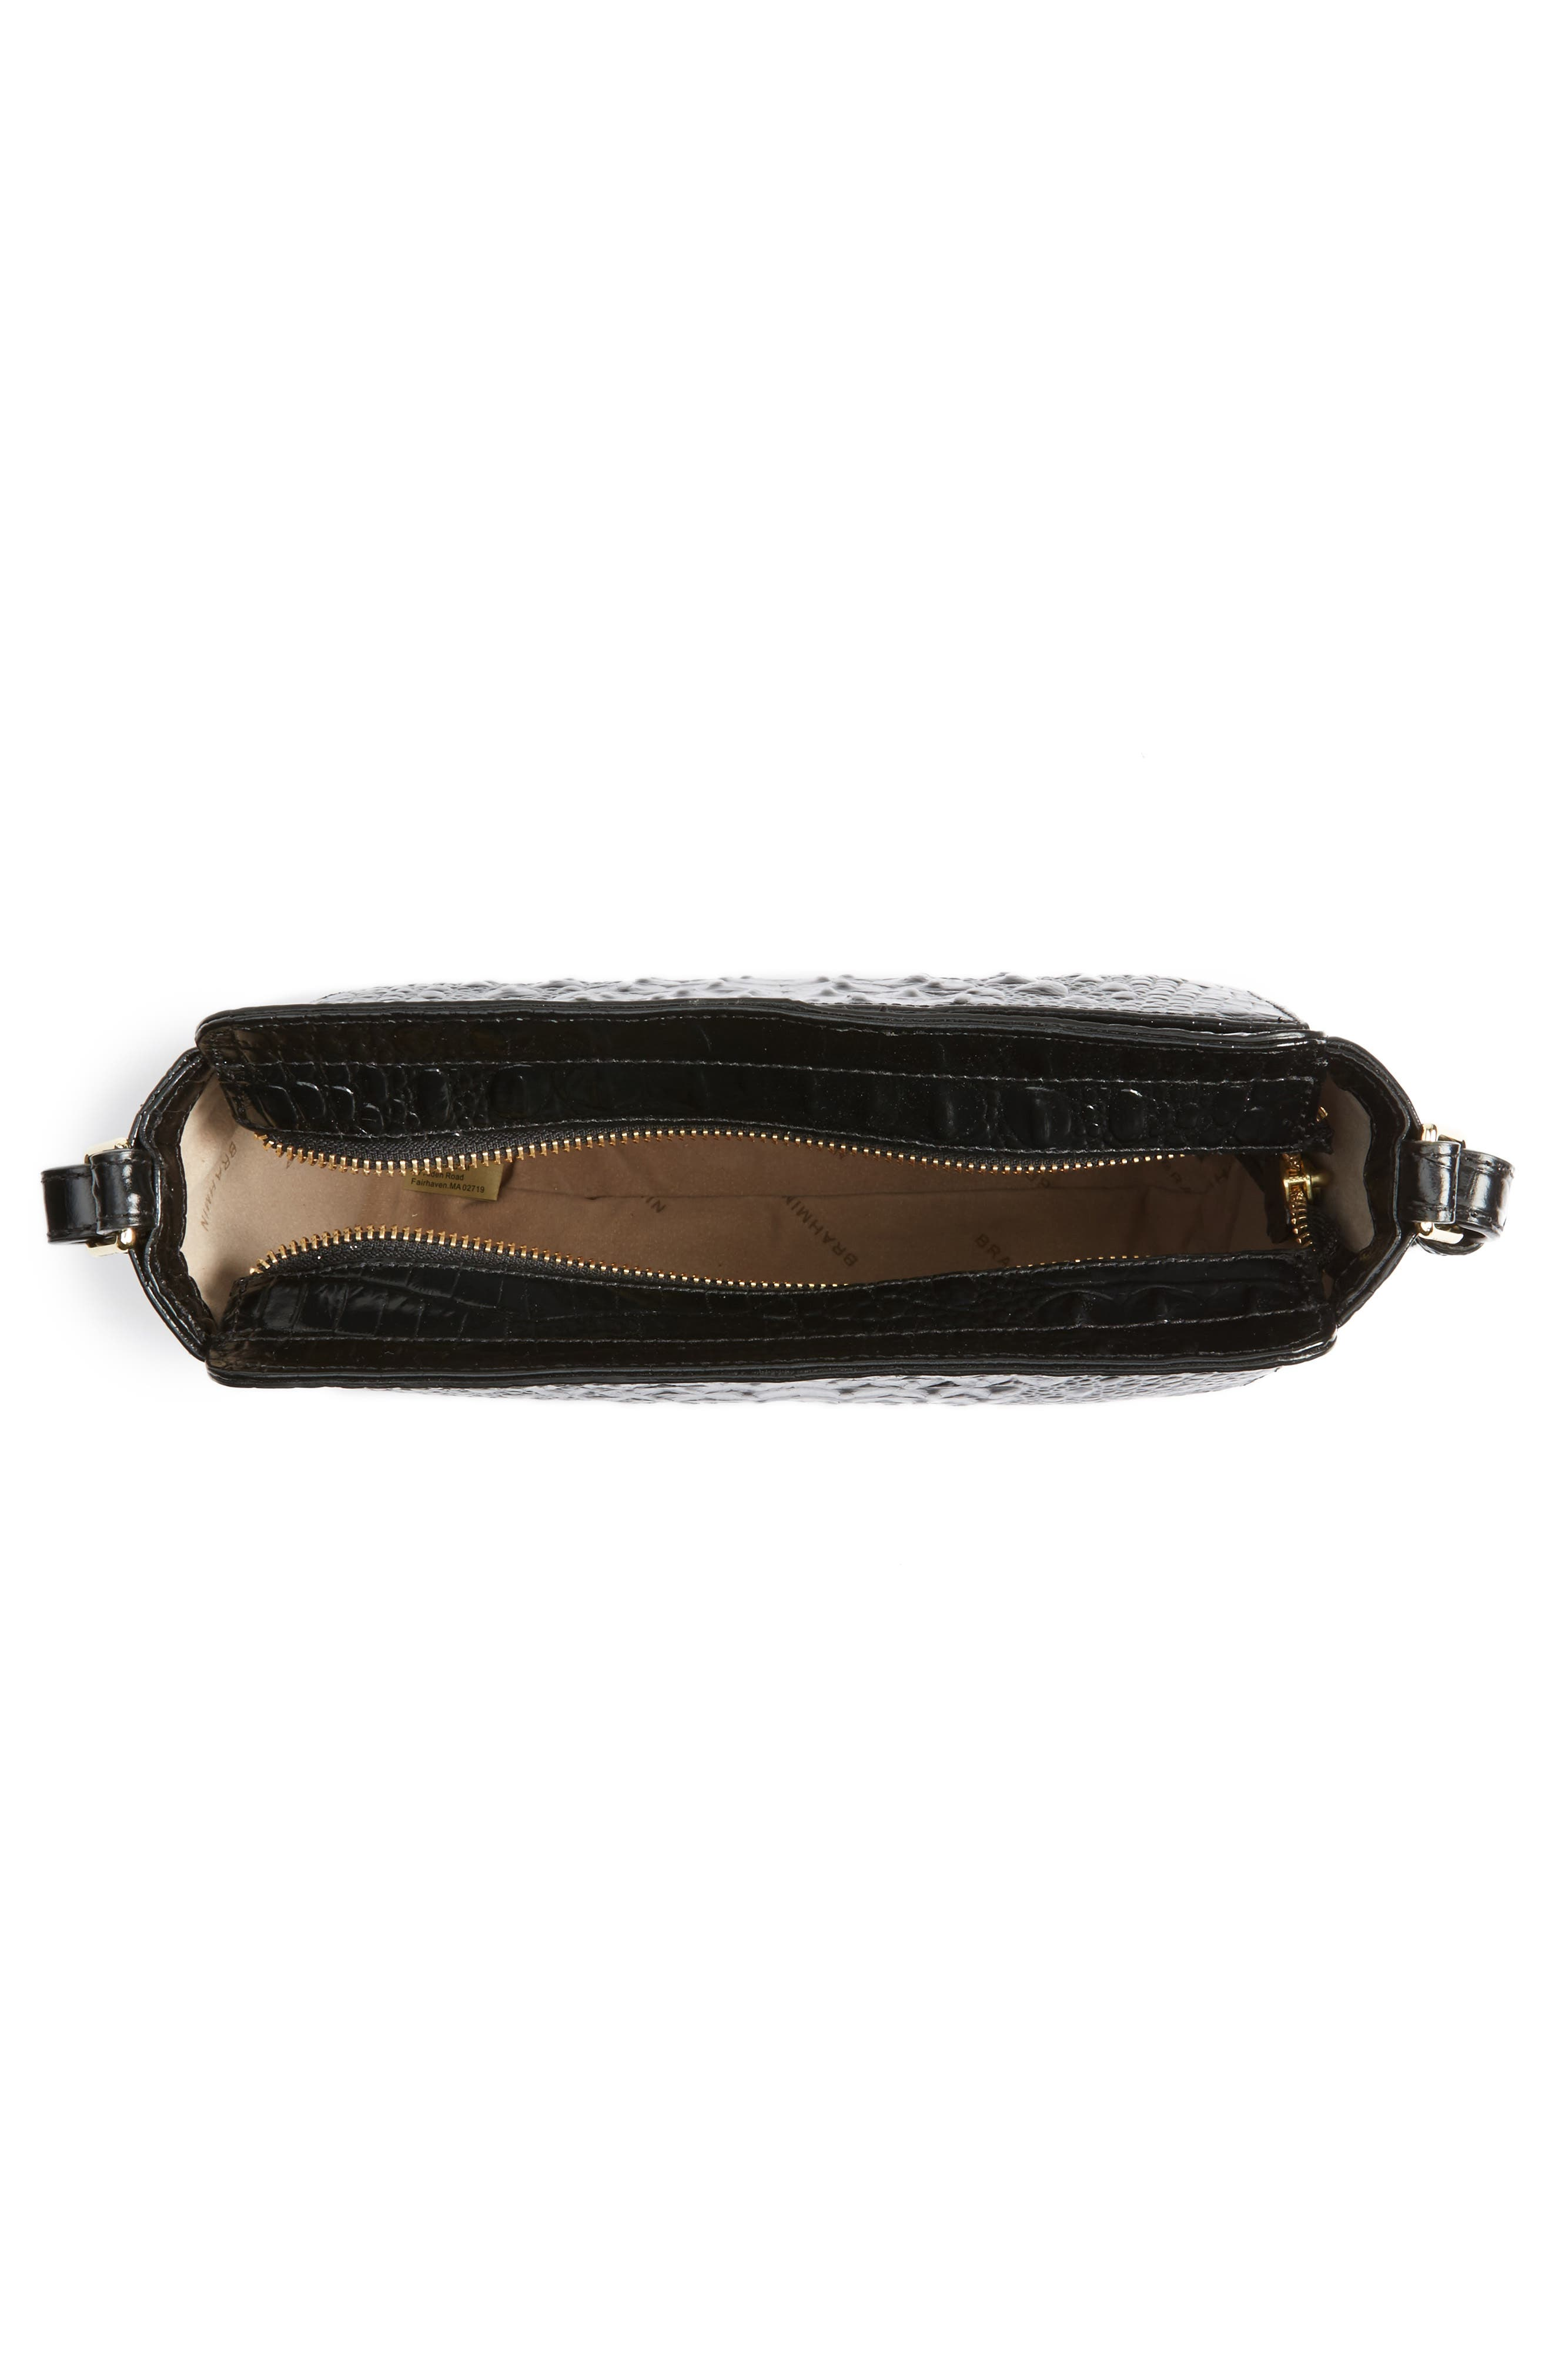 Melbourne Carrie Leather Crossbody Bag,                             Alternate thumbnail 6, color,                             Black